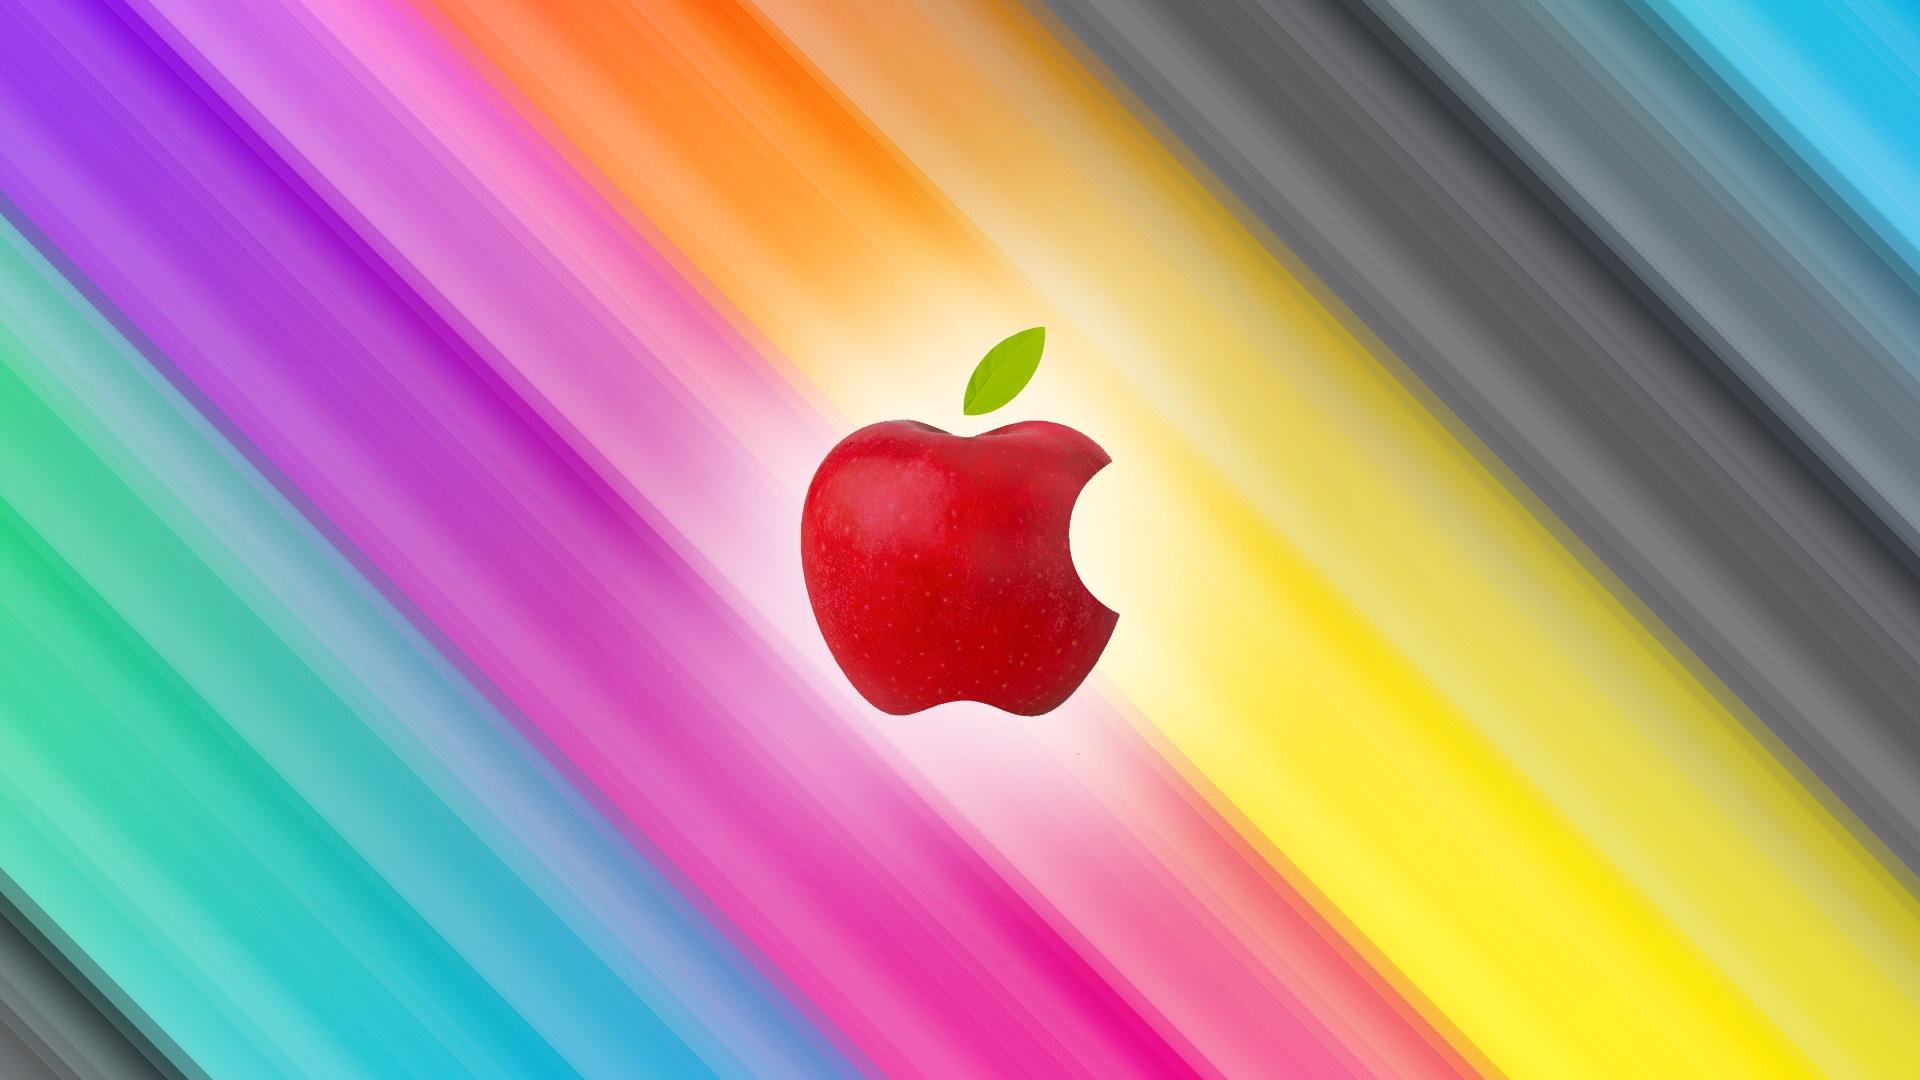 barres obliques apple fond - photo #2